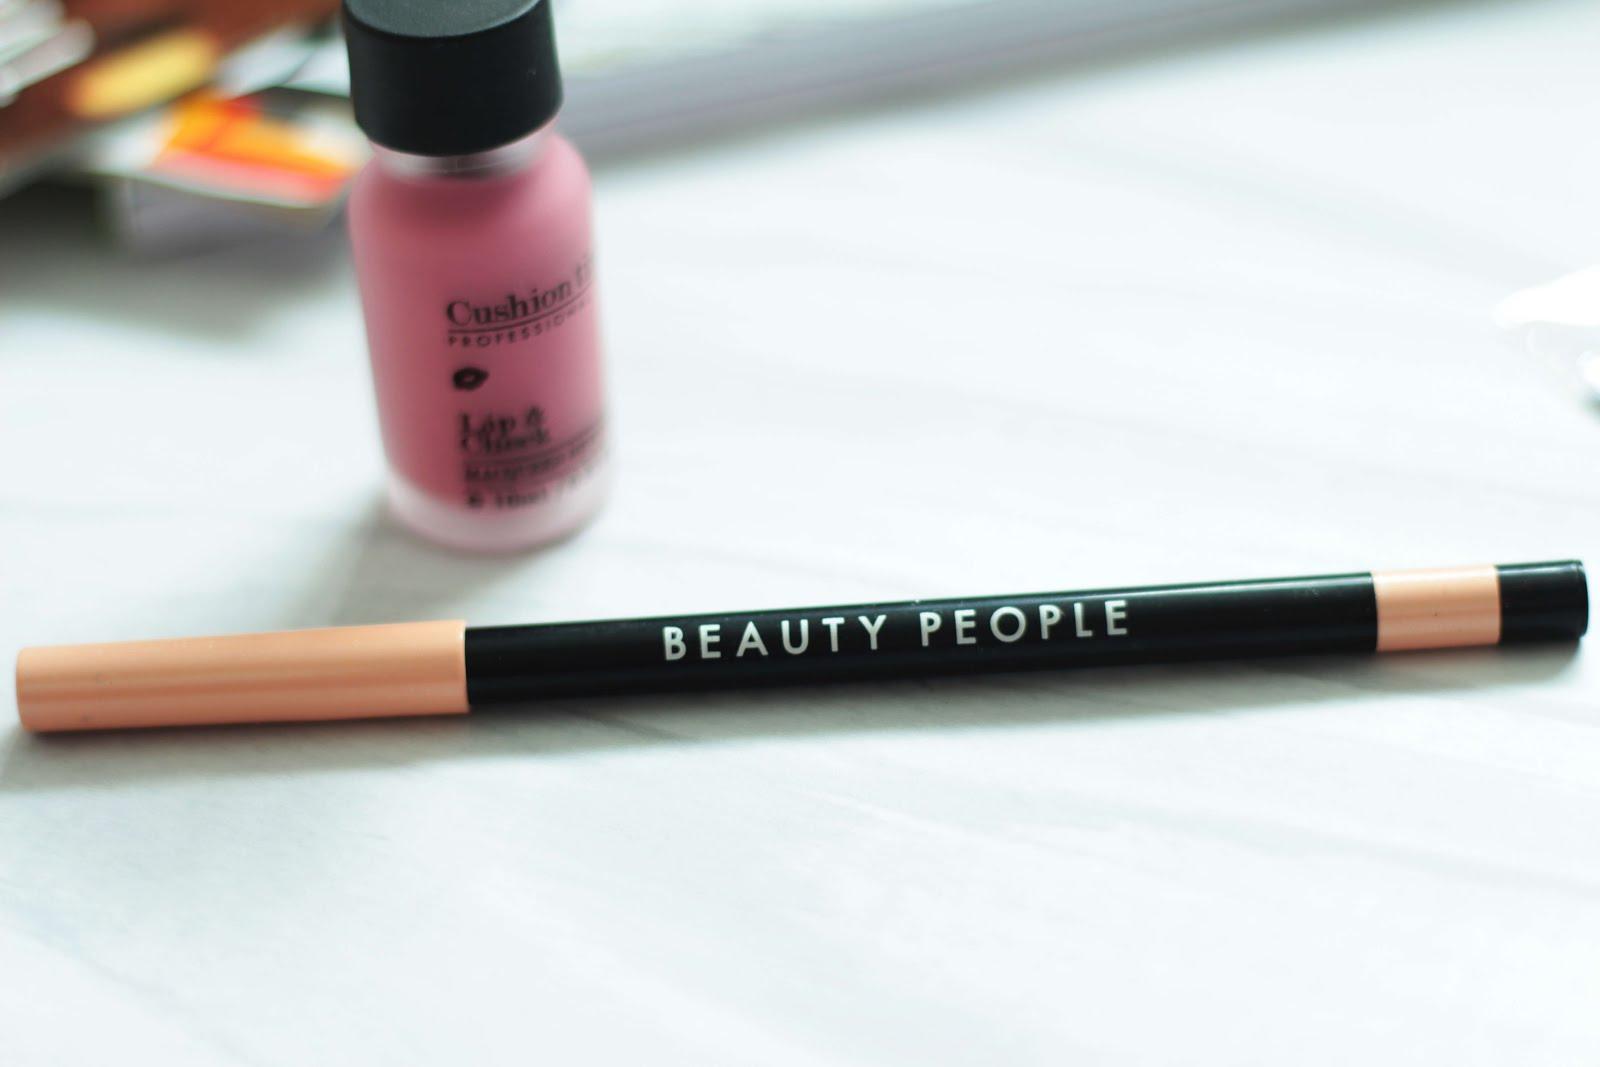 beauty people korean beauty brand eye liner review